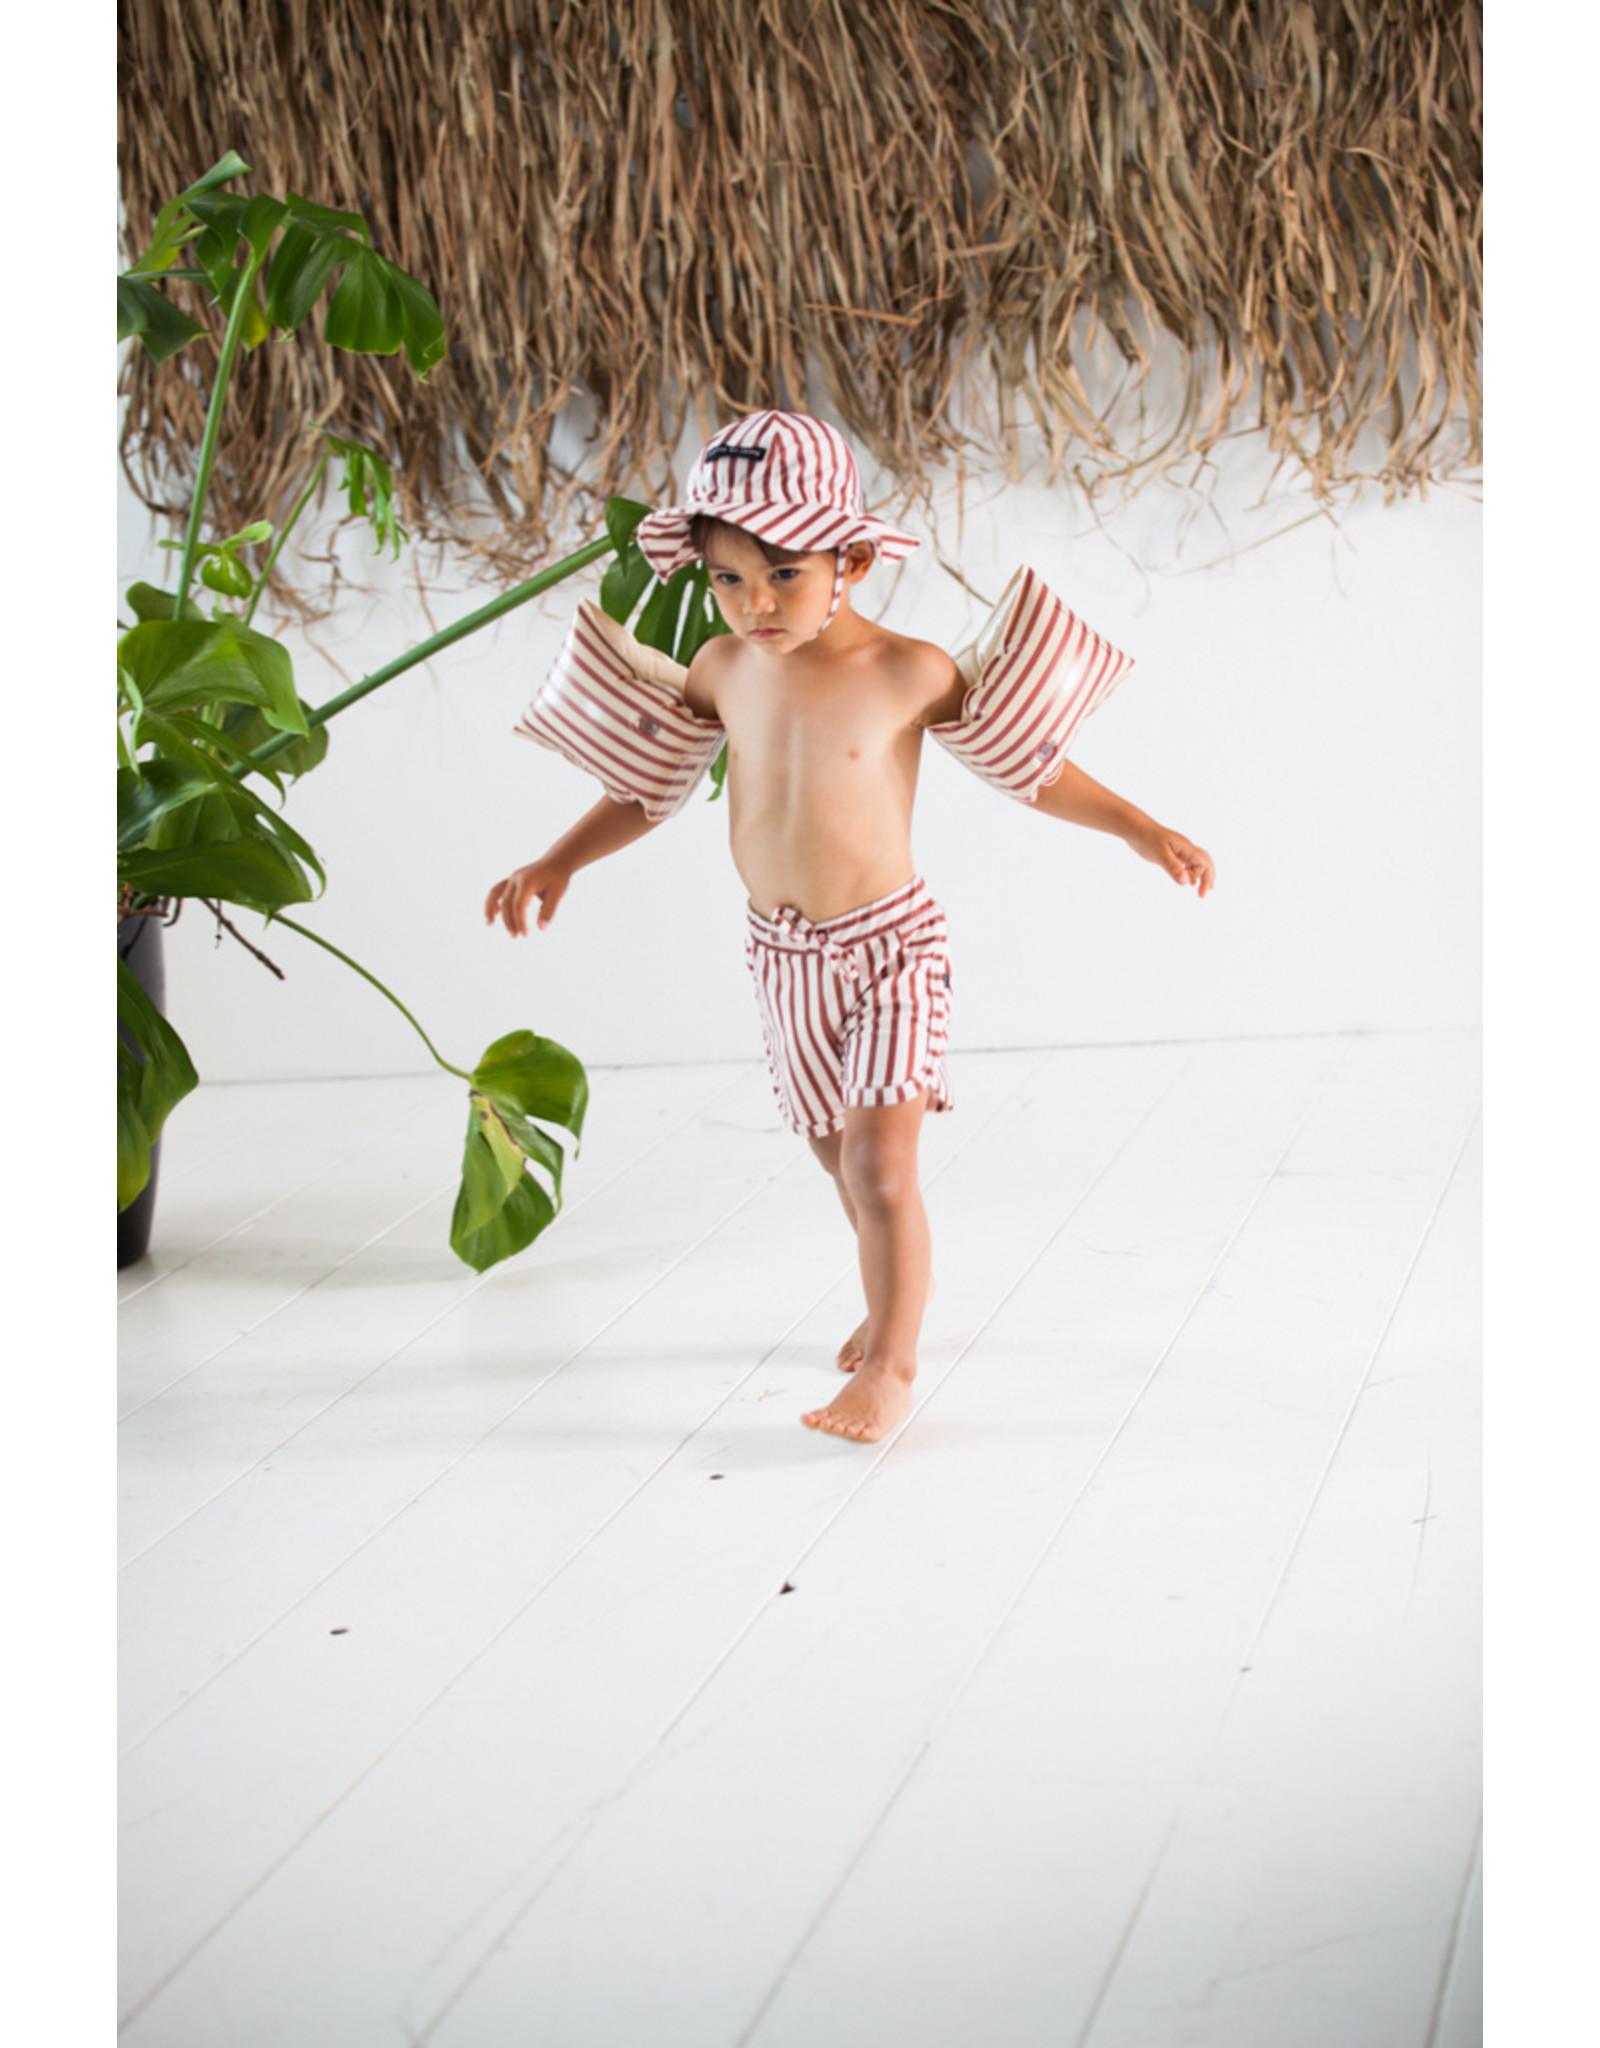 House of Jamie HOJ Swim Gym Shorts Baked Clay Stripes